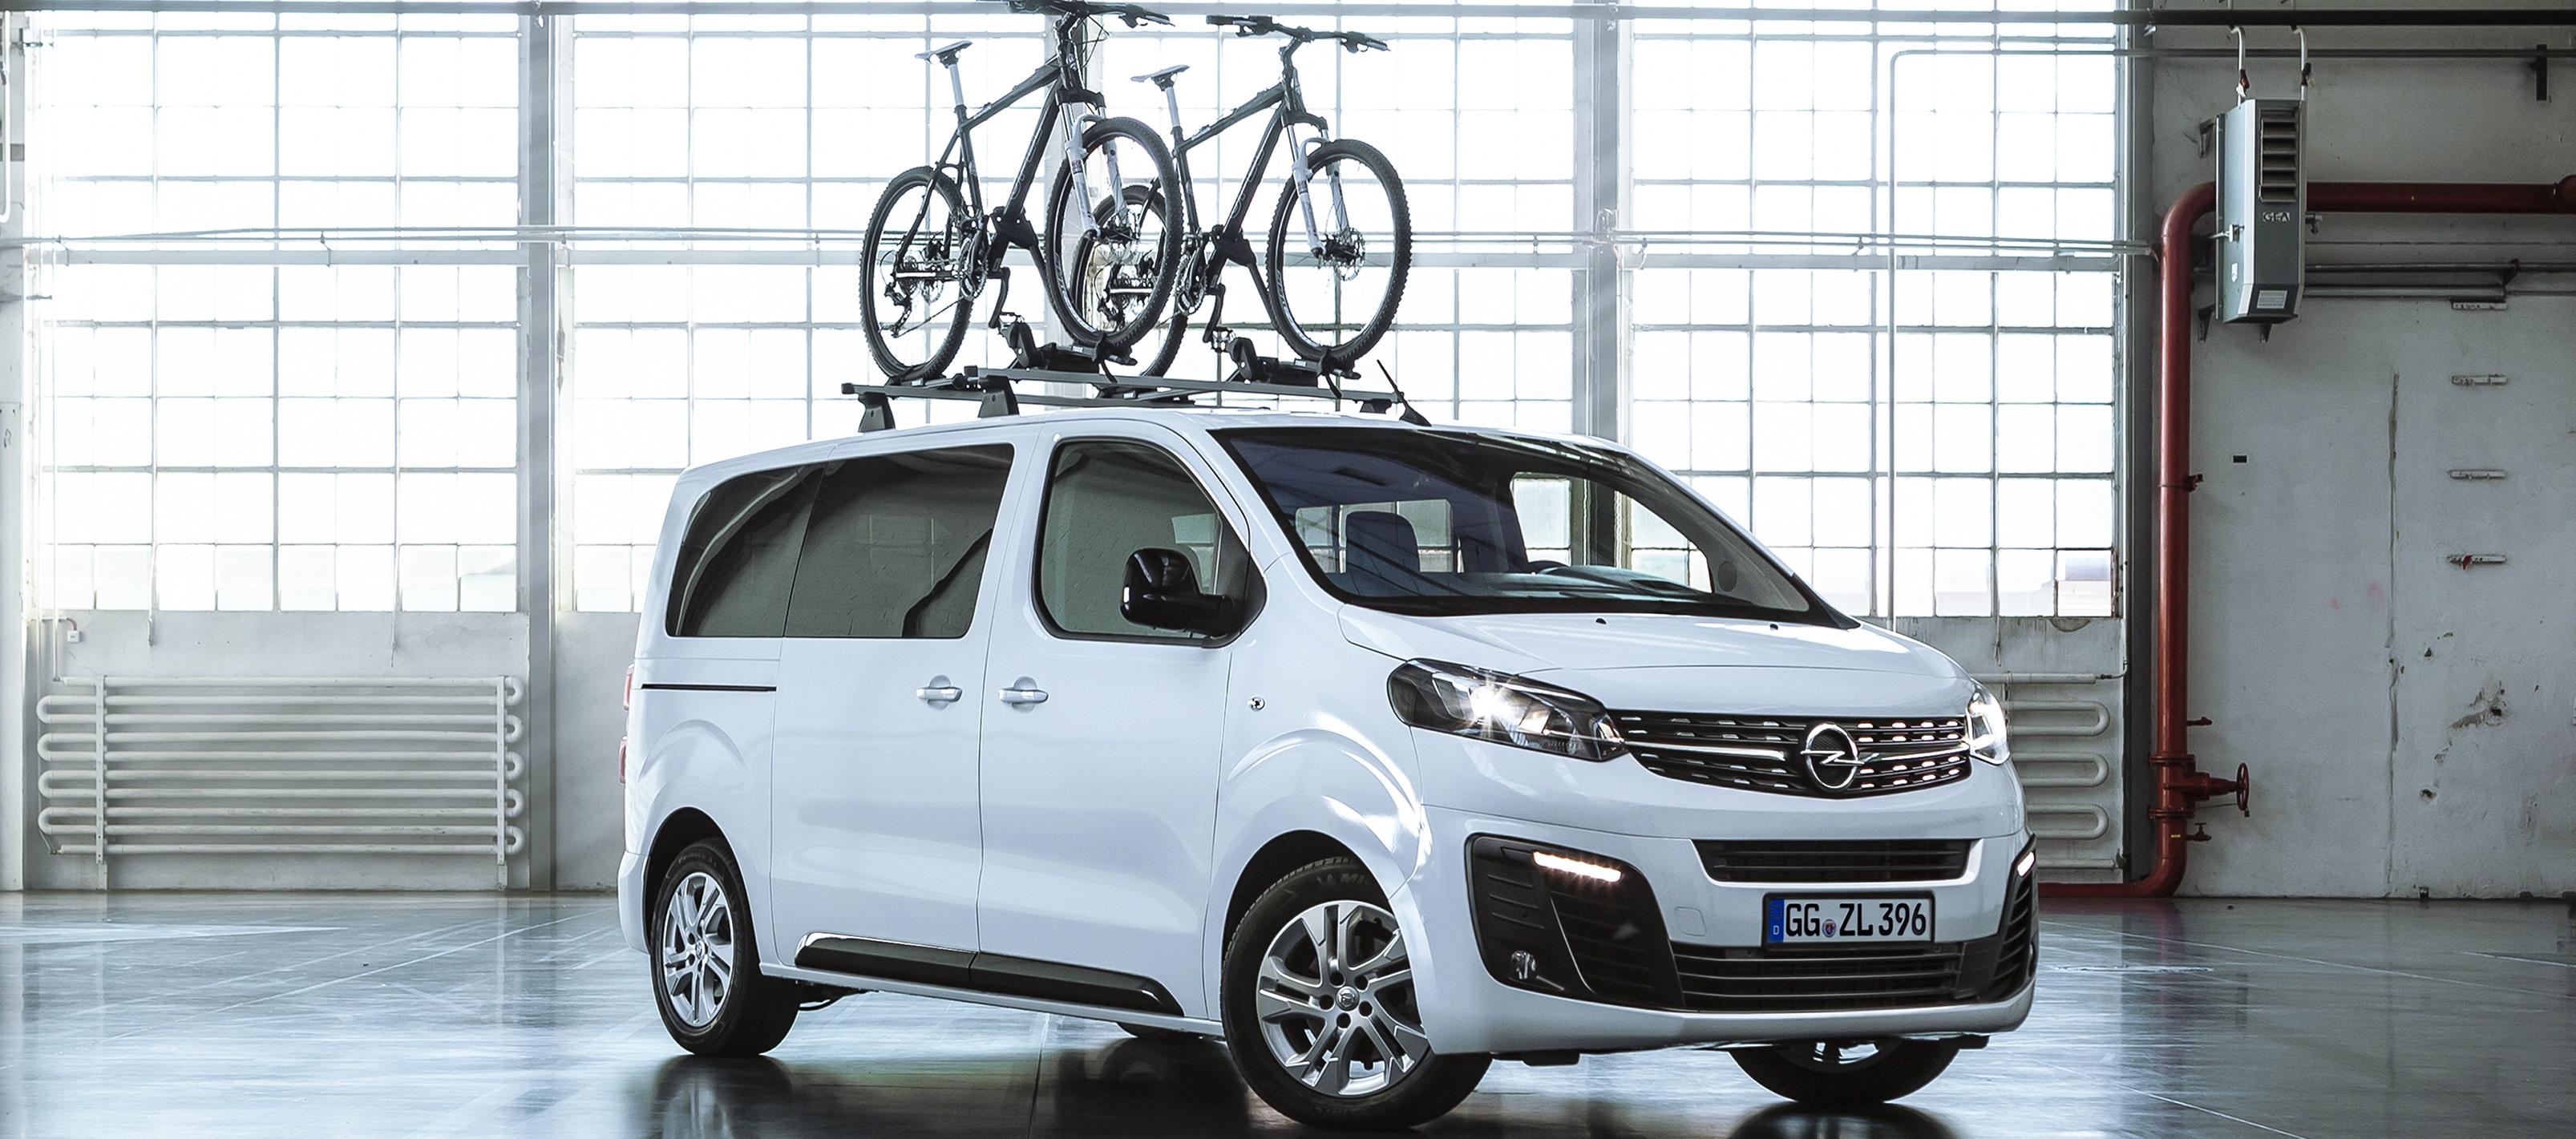 Opel Zafira Life, apta para todo